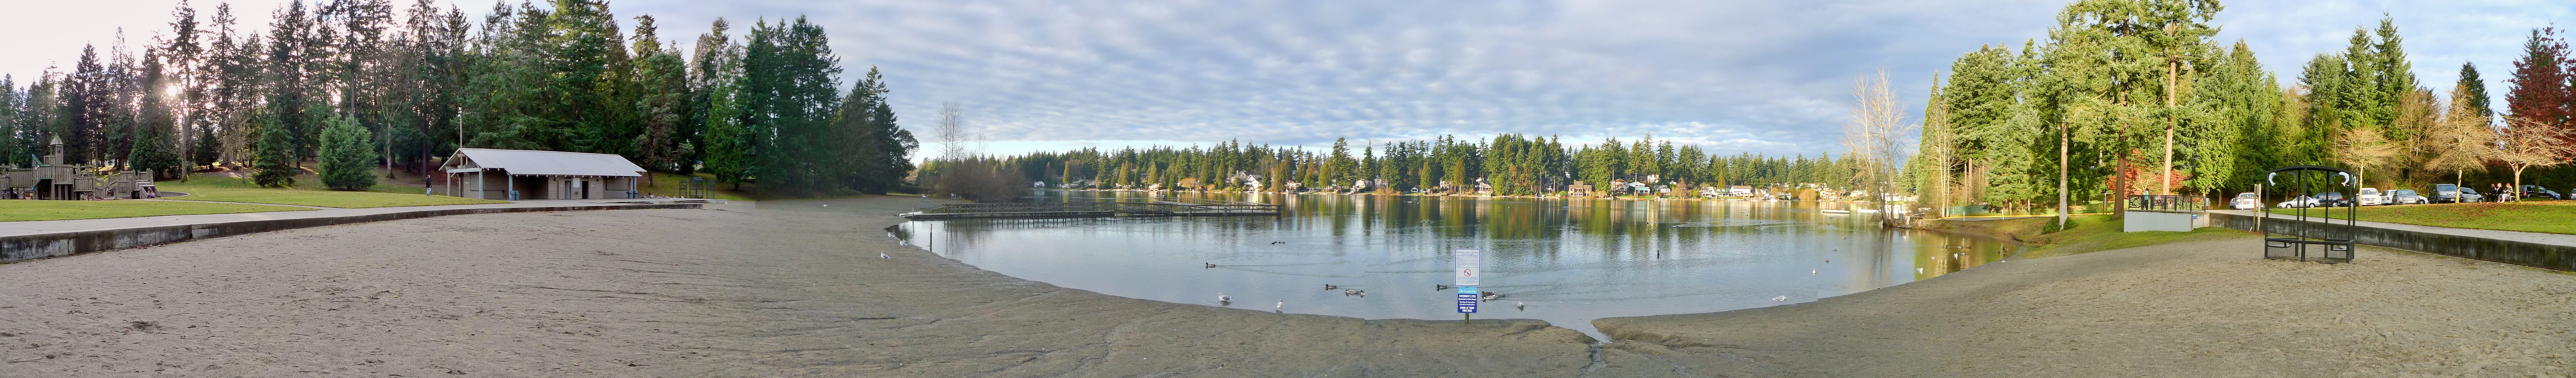 Steel Lake Park : Steel lake park panorama took juliana to